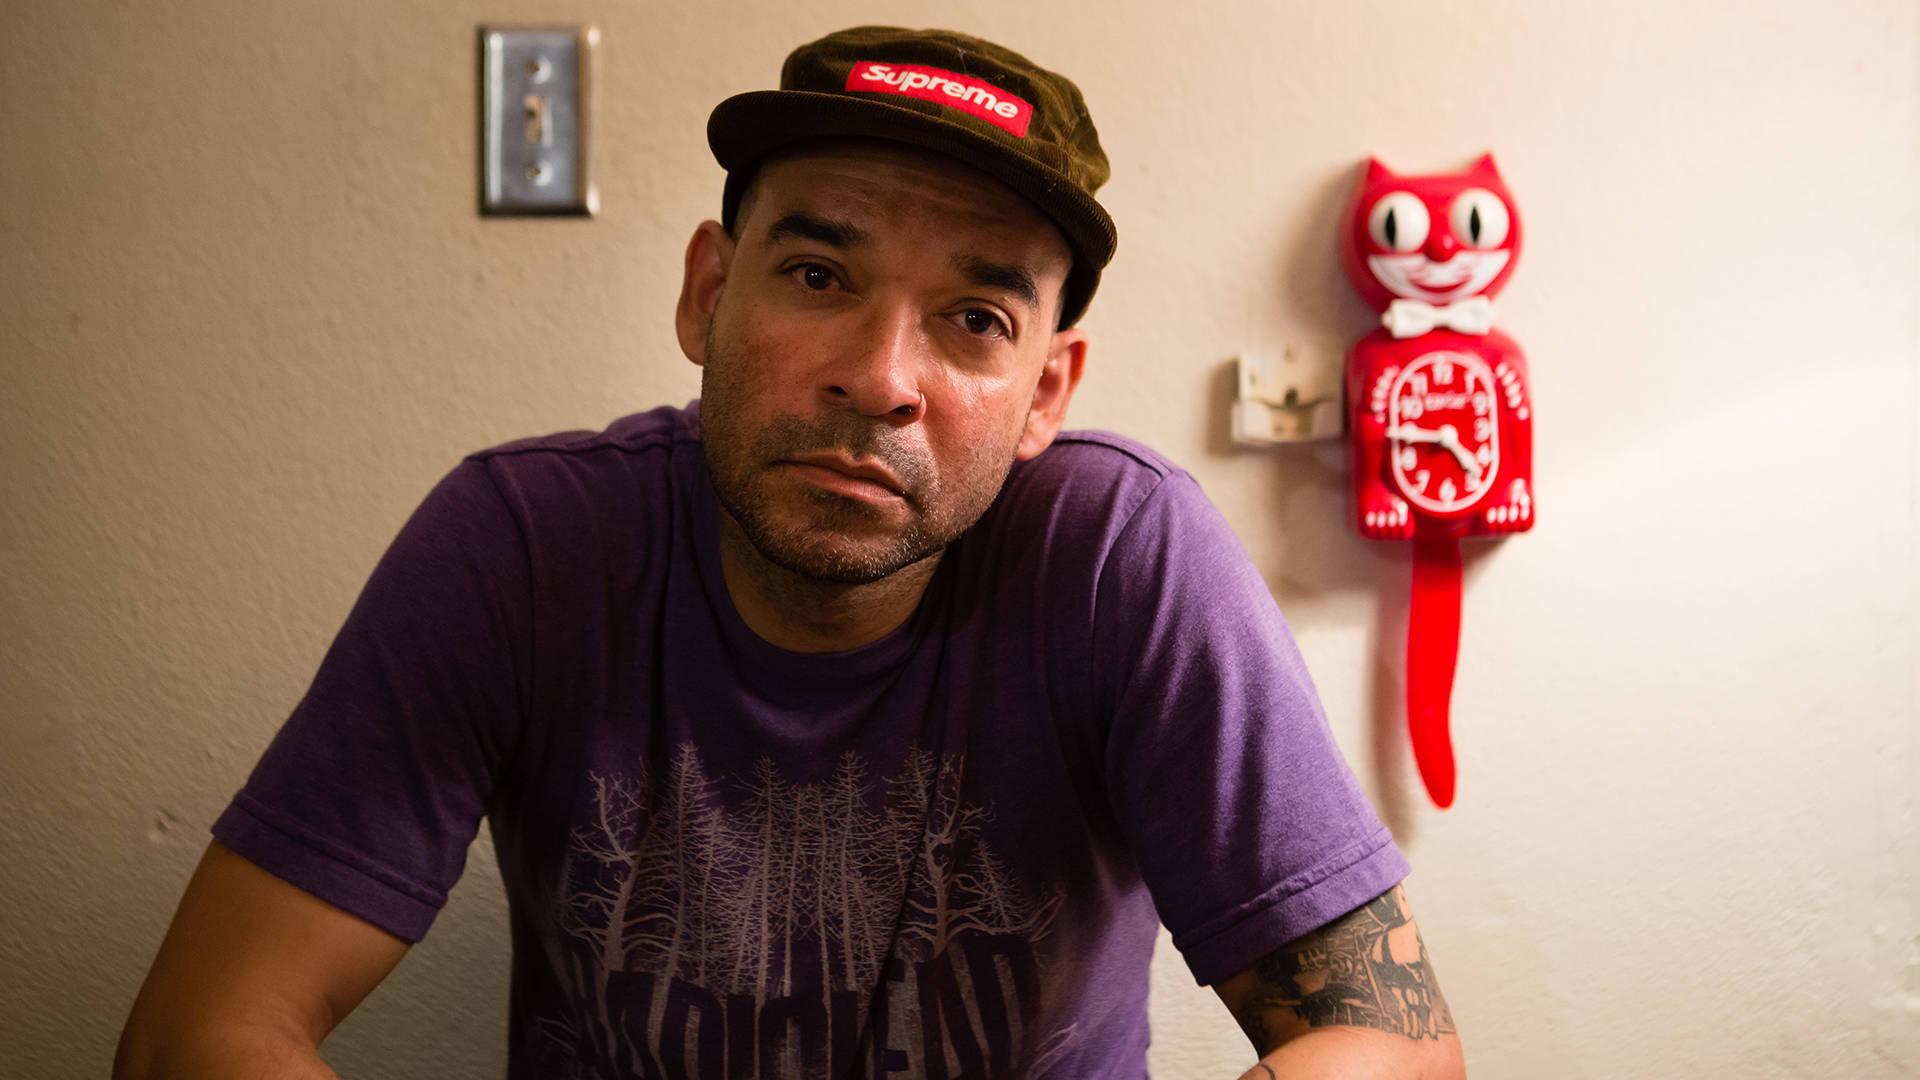 After Hurricane Maria hit, Puerto Rican artist Otura Mun got to work rebuilding his recording studio.  Bert Johnson